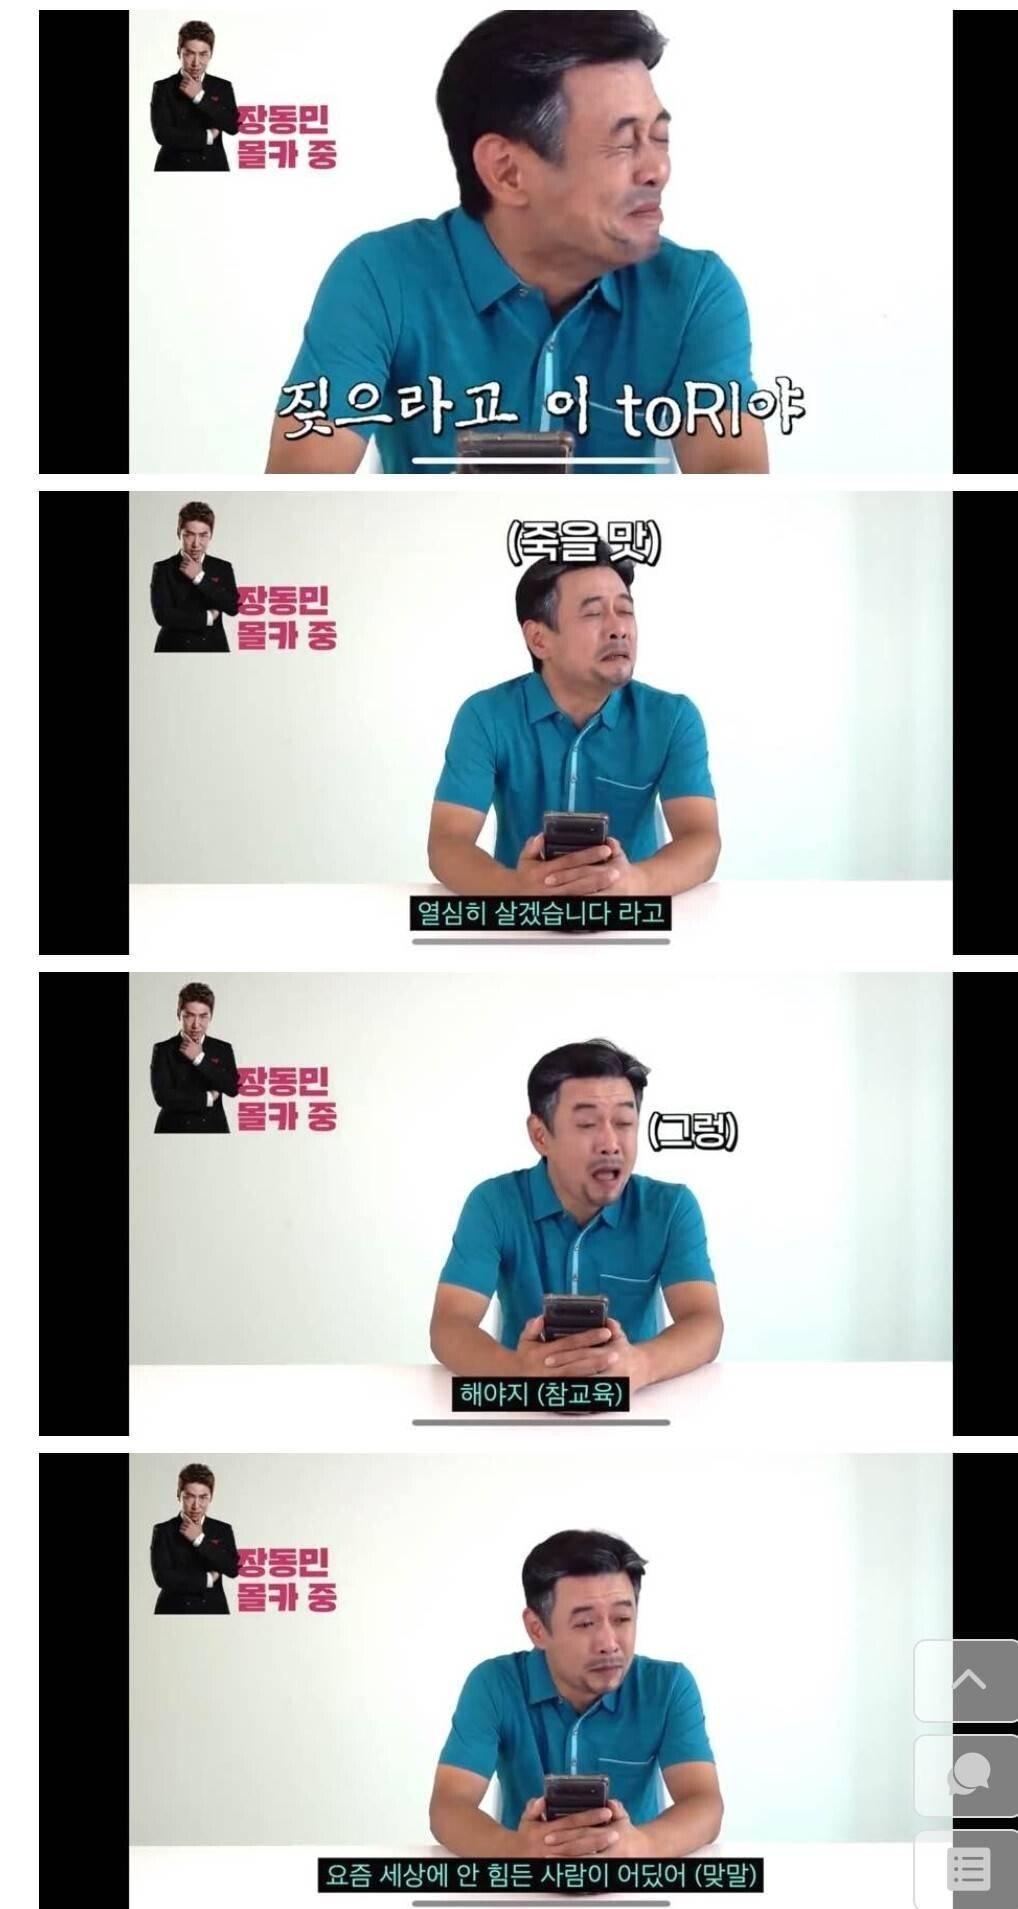 99.jpeg 개그민 김대희 우정테스트...jpg